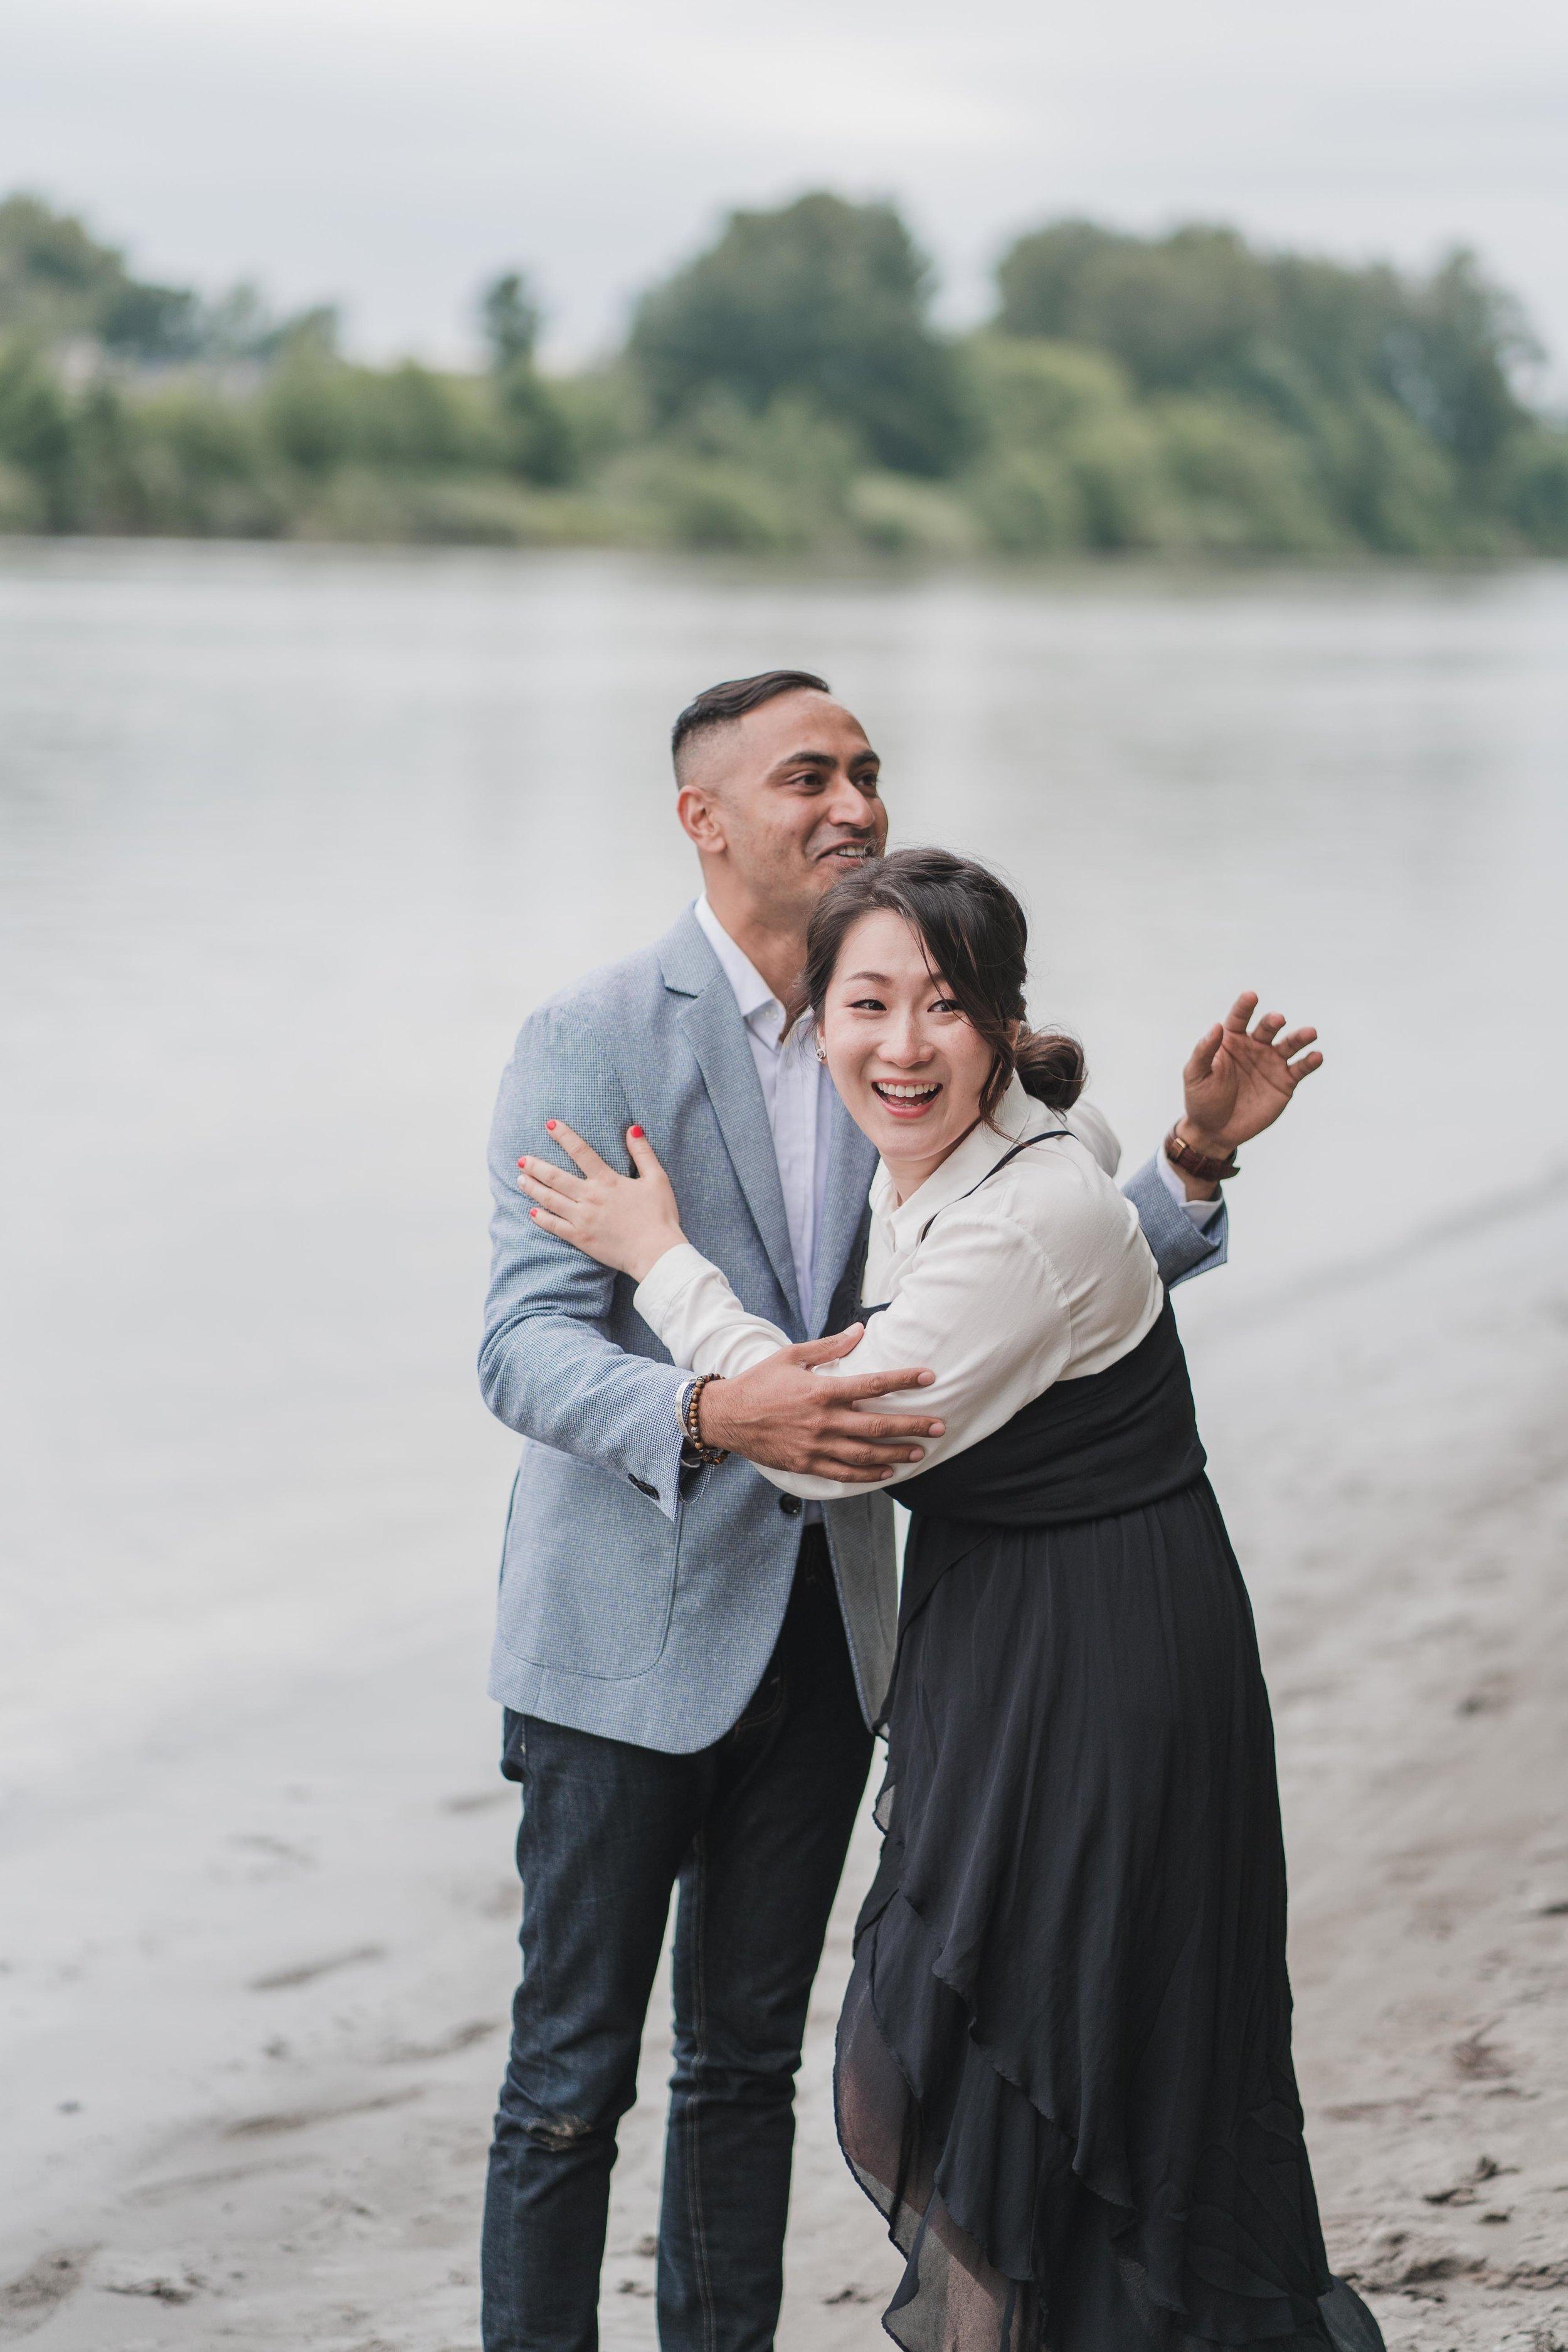 20190622 - Monika & Johnson Engagement - 0147.jpg